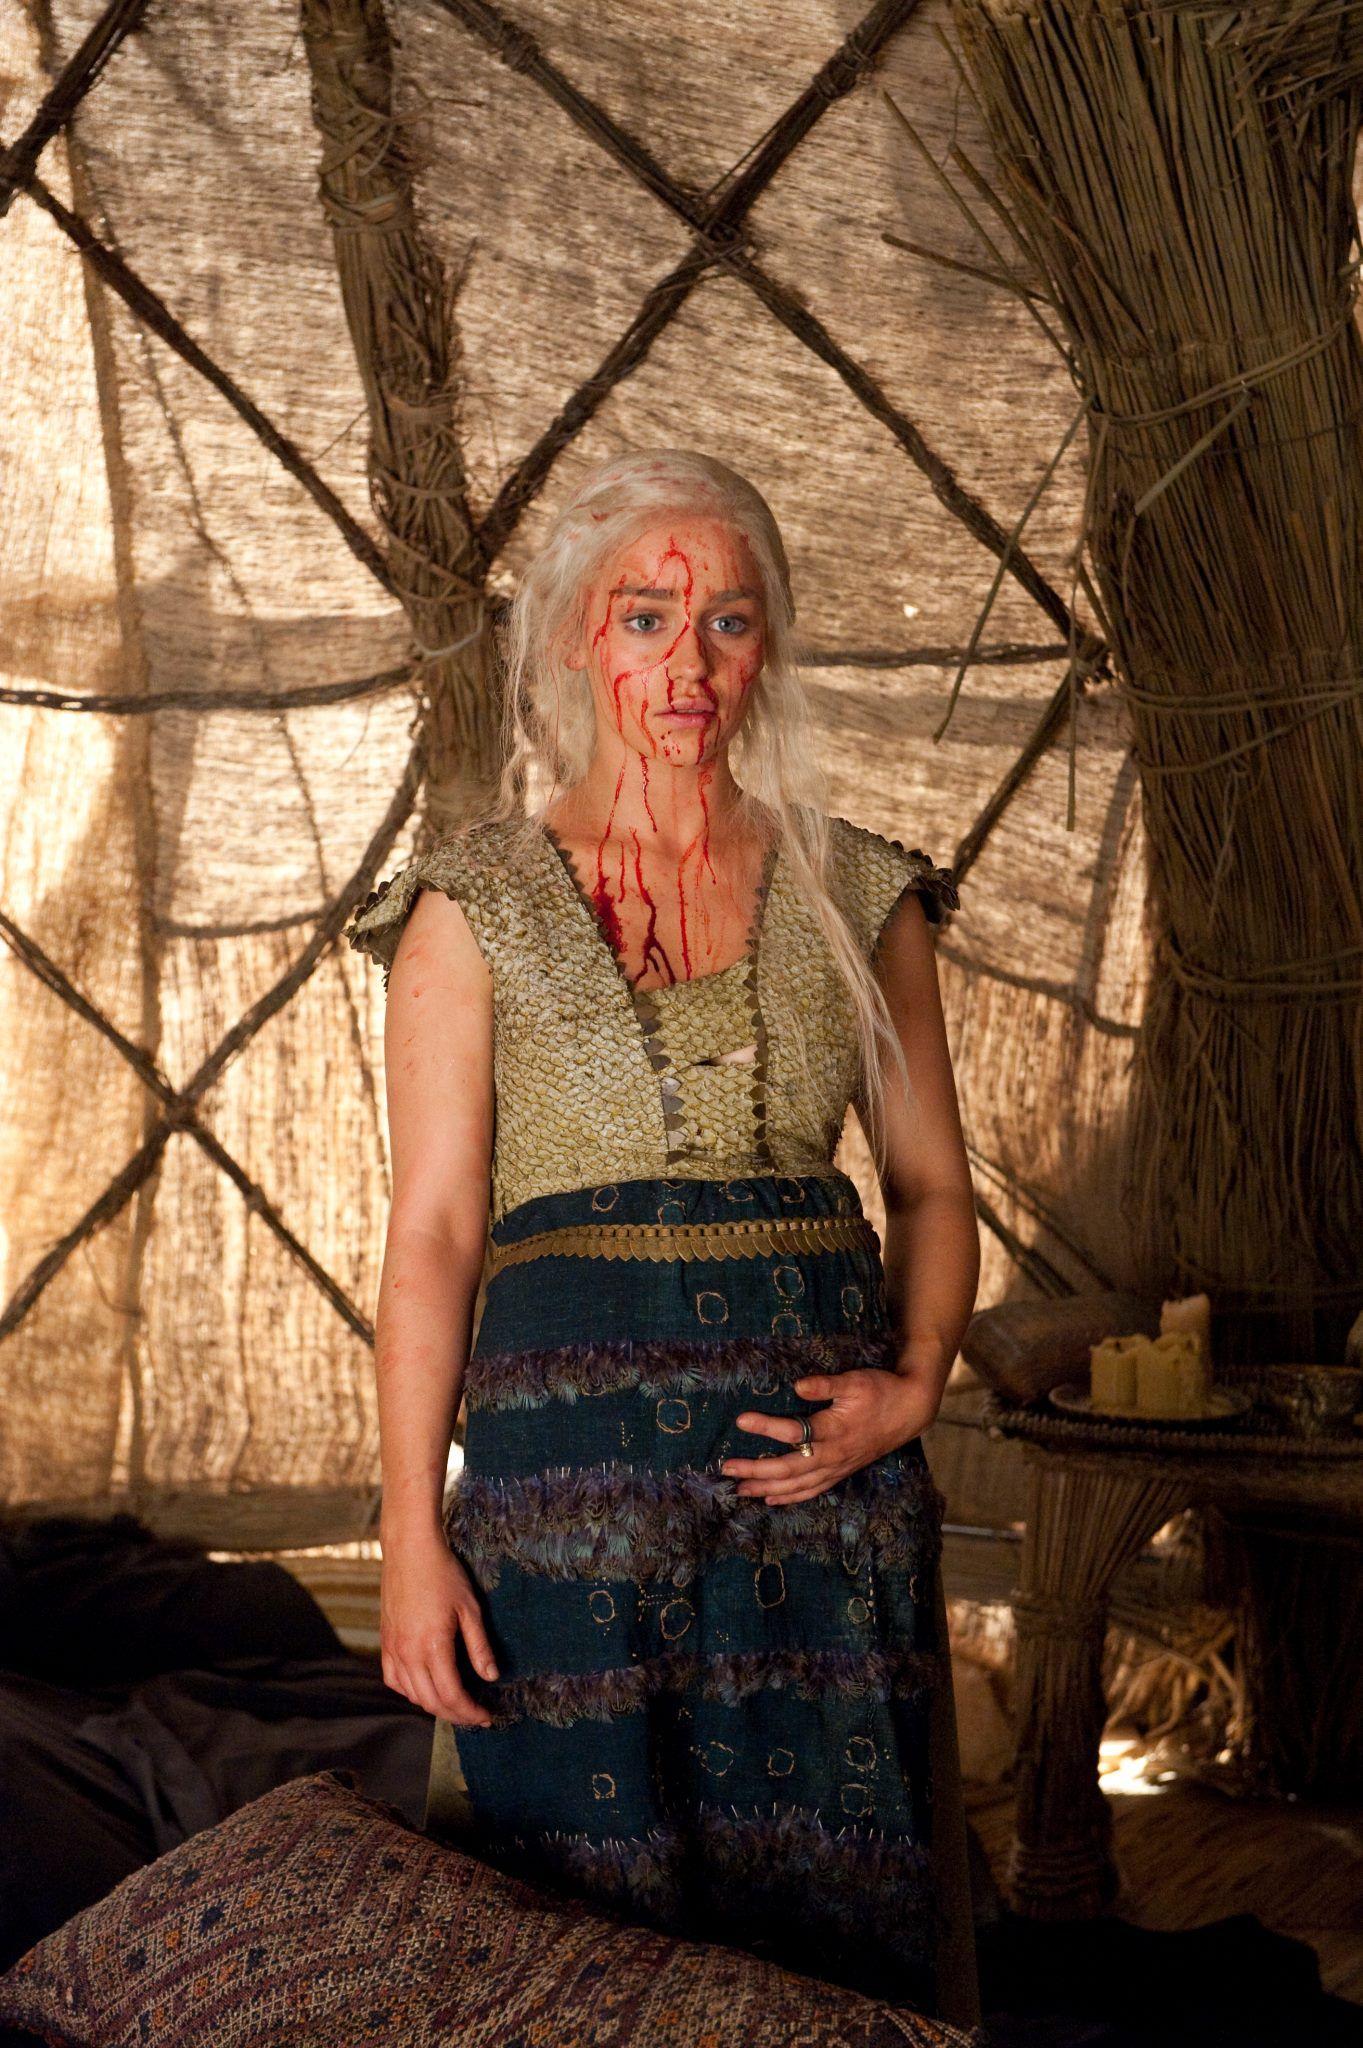 Daenerys targaryen and khal drogo wallpaper daenerys targaryen wedding - This Was One Of The Saddest Moments That Witch Kills Drogo S Horse Used Black Game Of Thrones Episodesiron Thronedaenerys Targaryenemilia